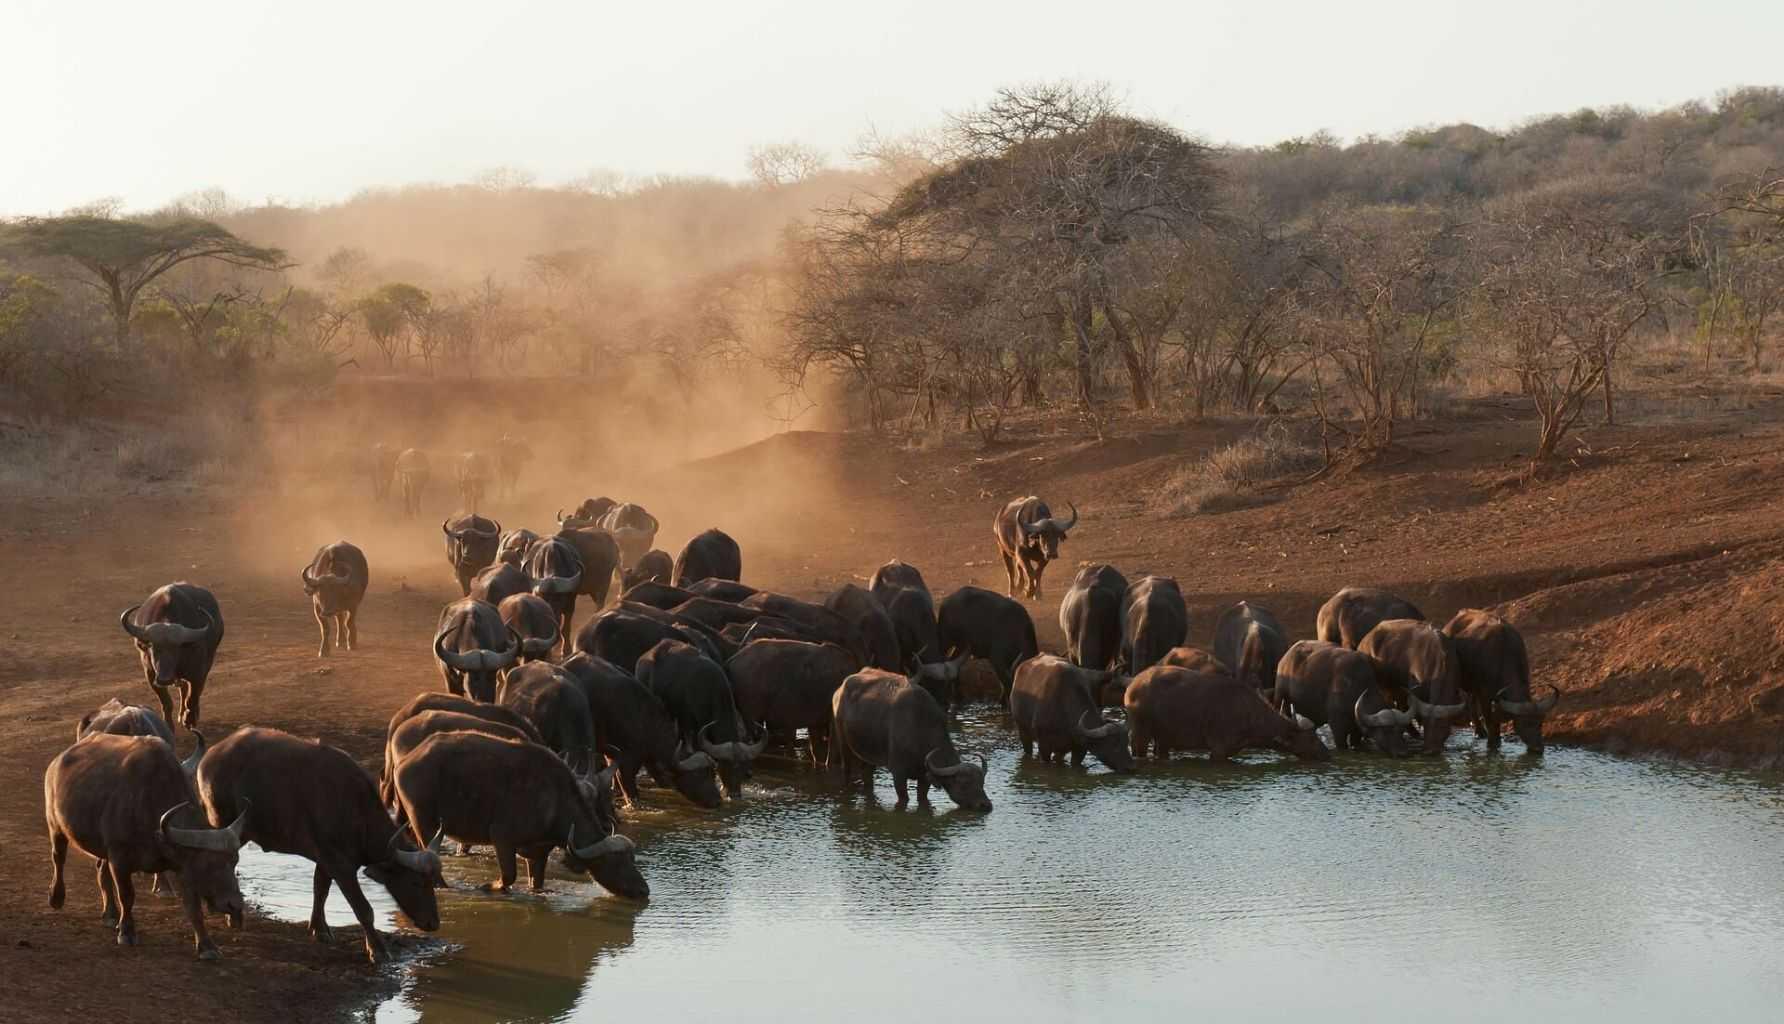 Suedafrika Urlaub Büffeln